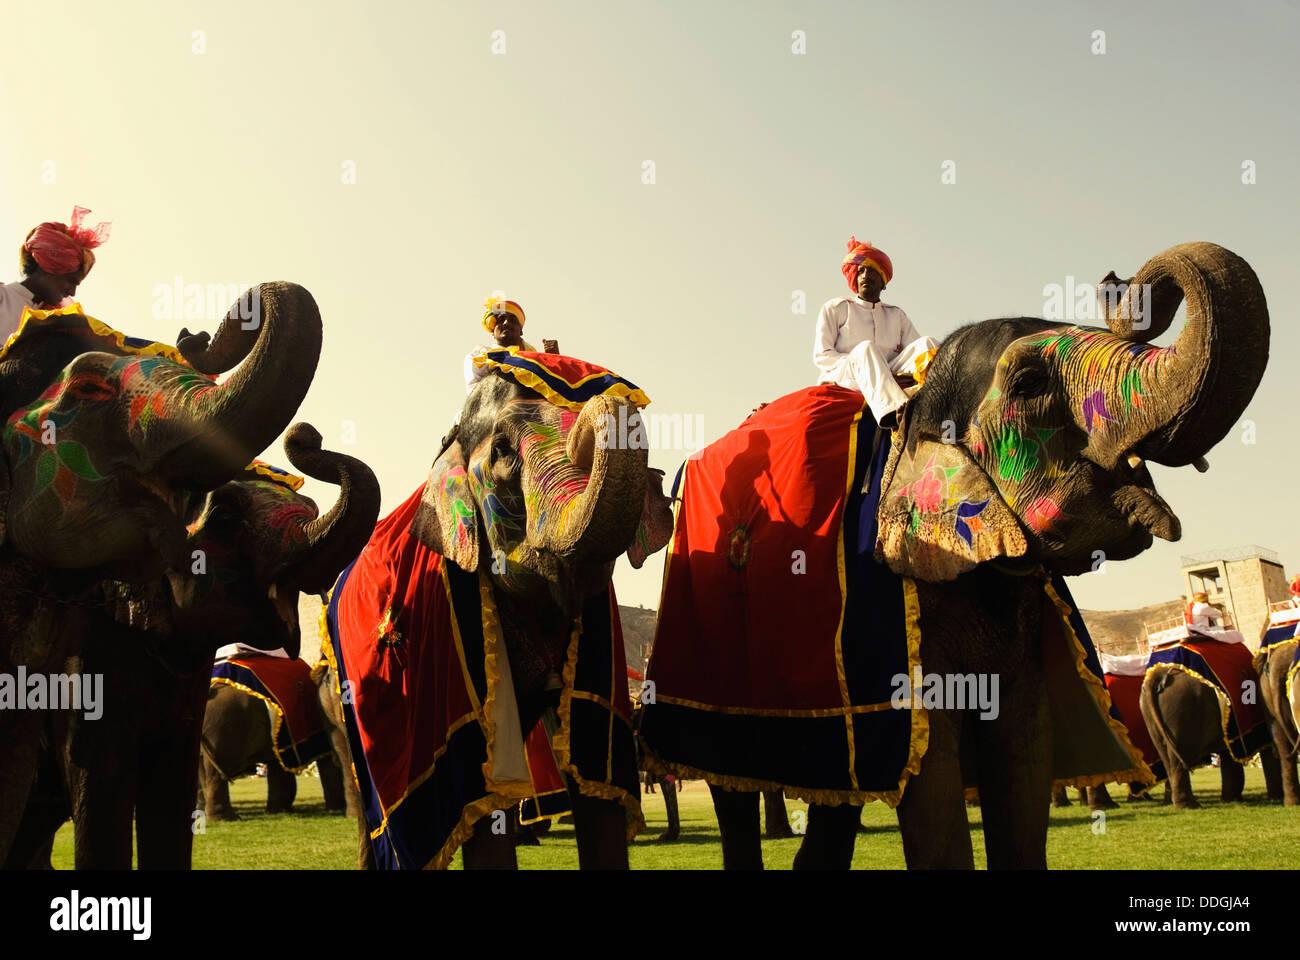 Mahouts con elefantes en Elephant Festival, Jaipur, Rajasthan, India Foto de stock